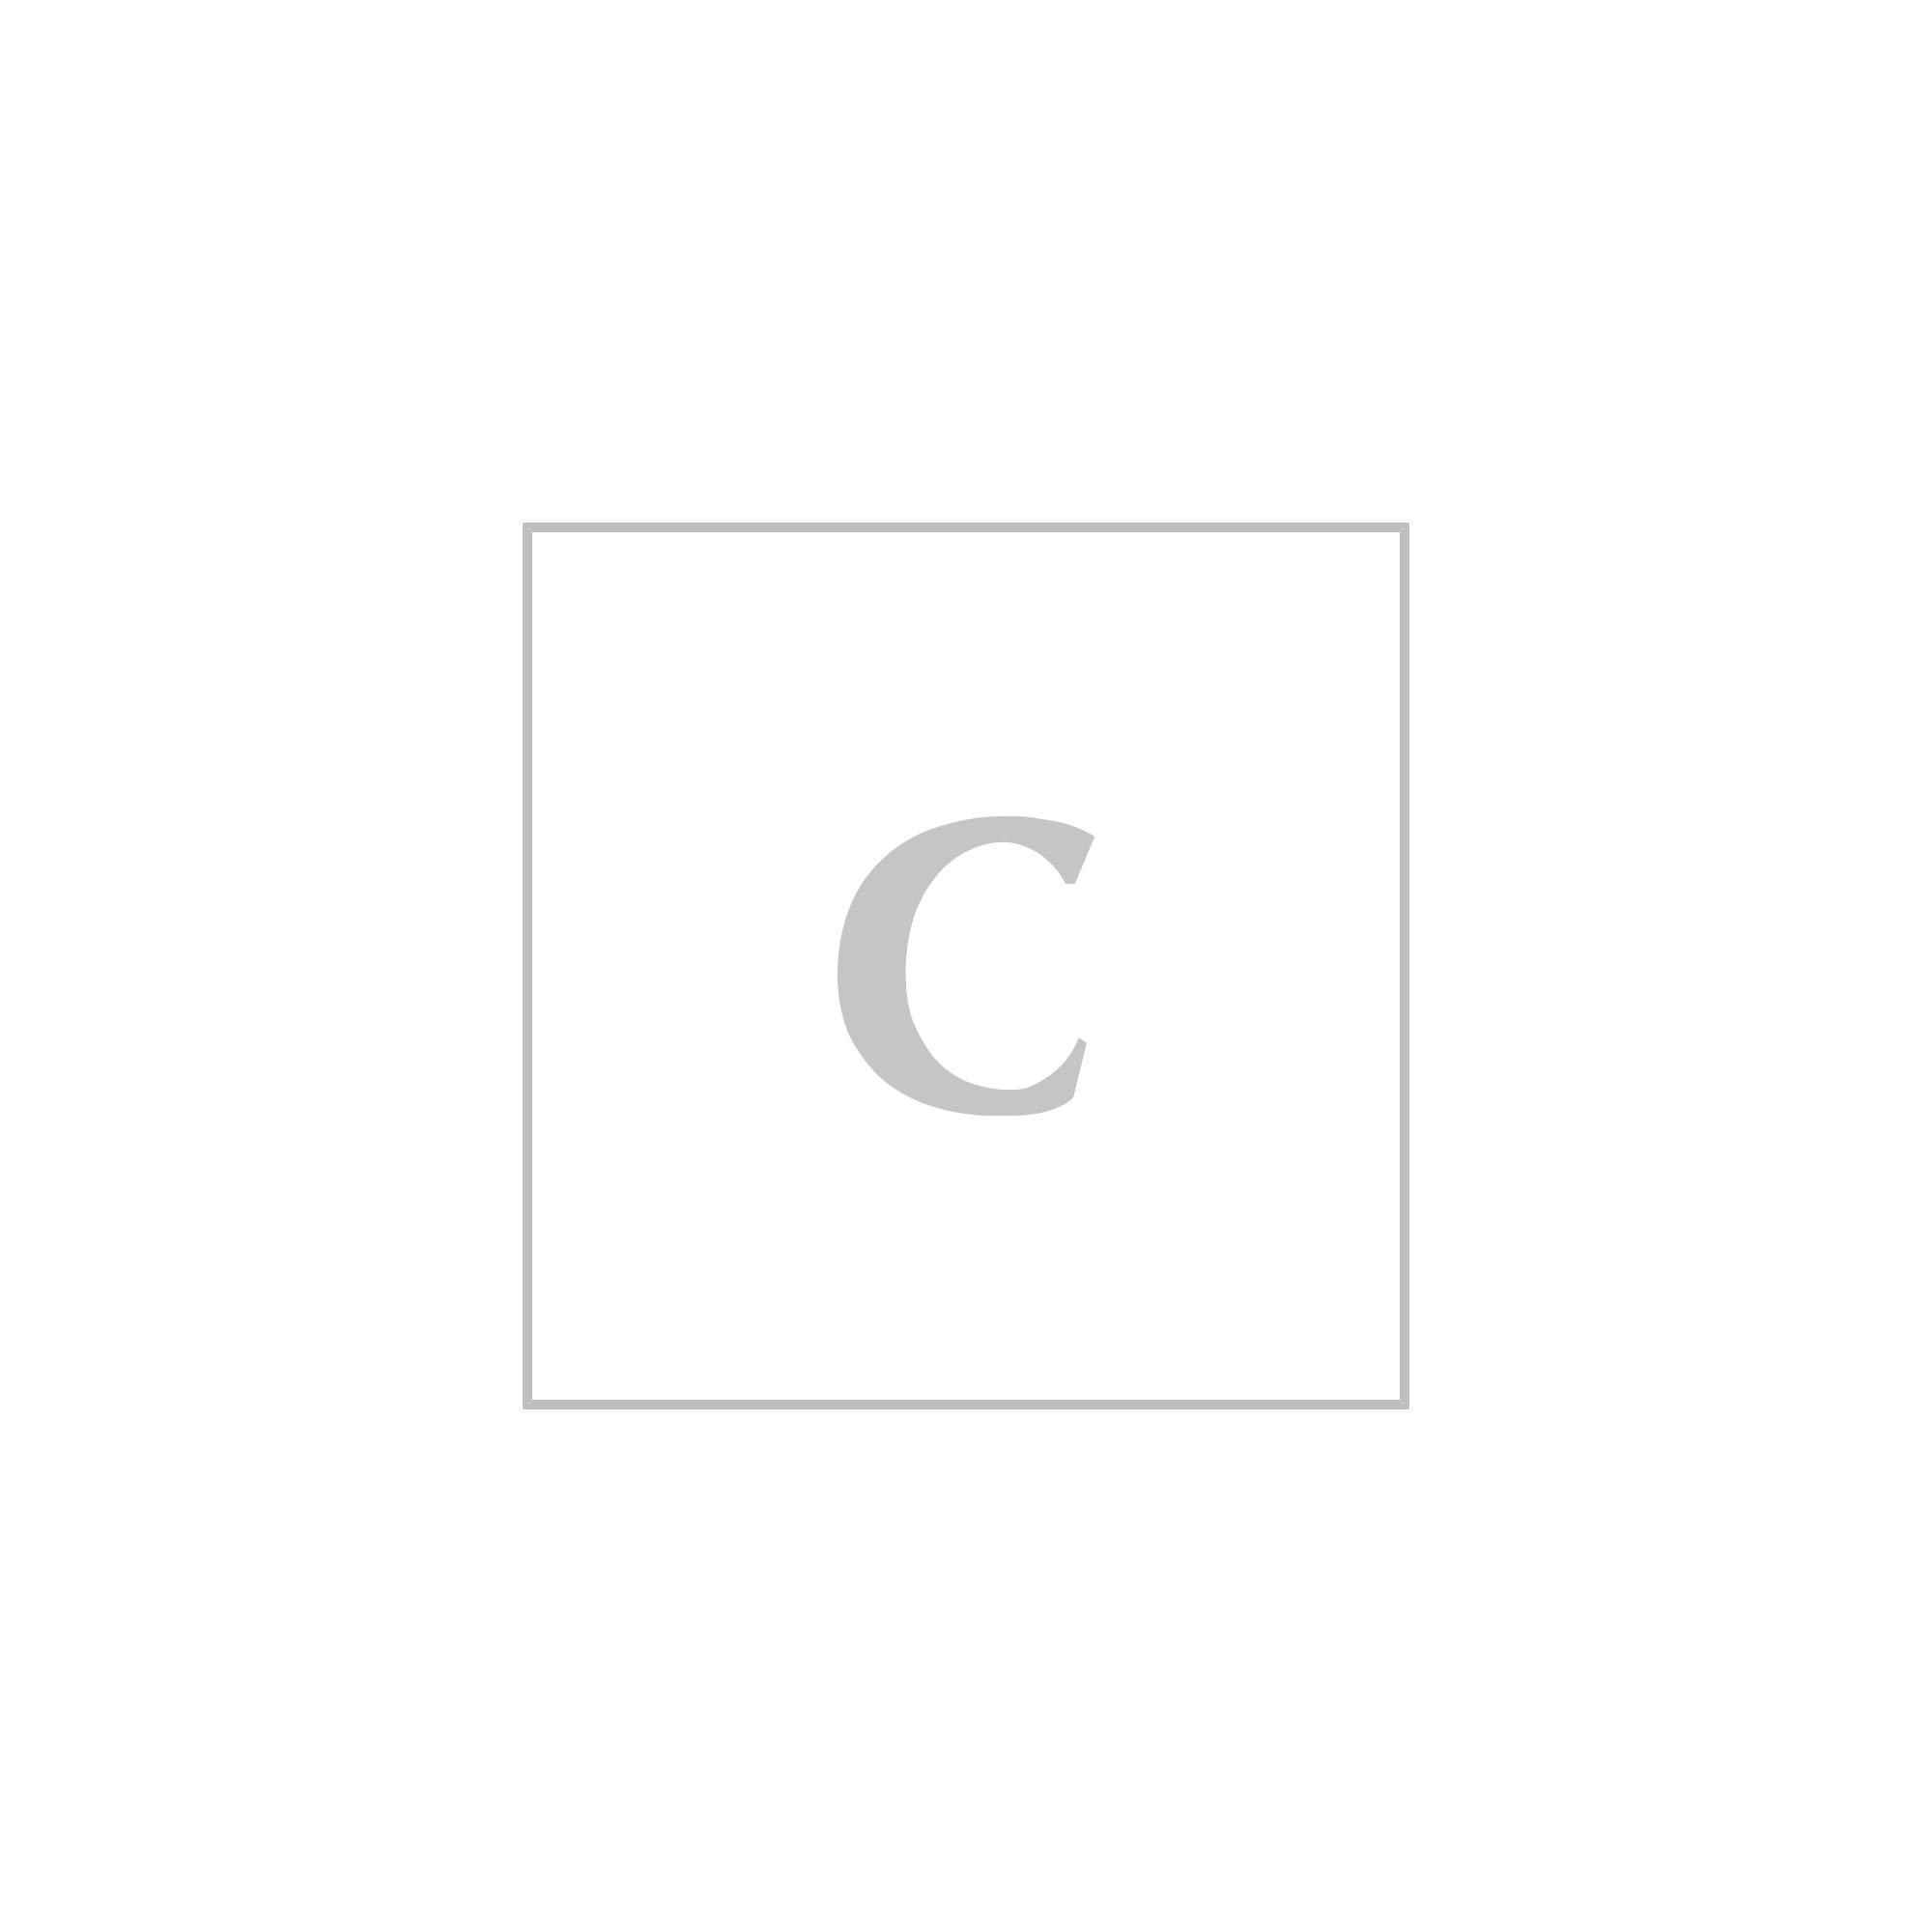 Bottega veneta intrecciato document holder